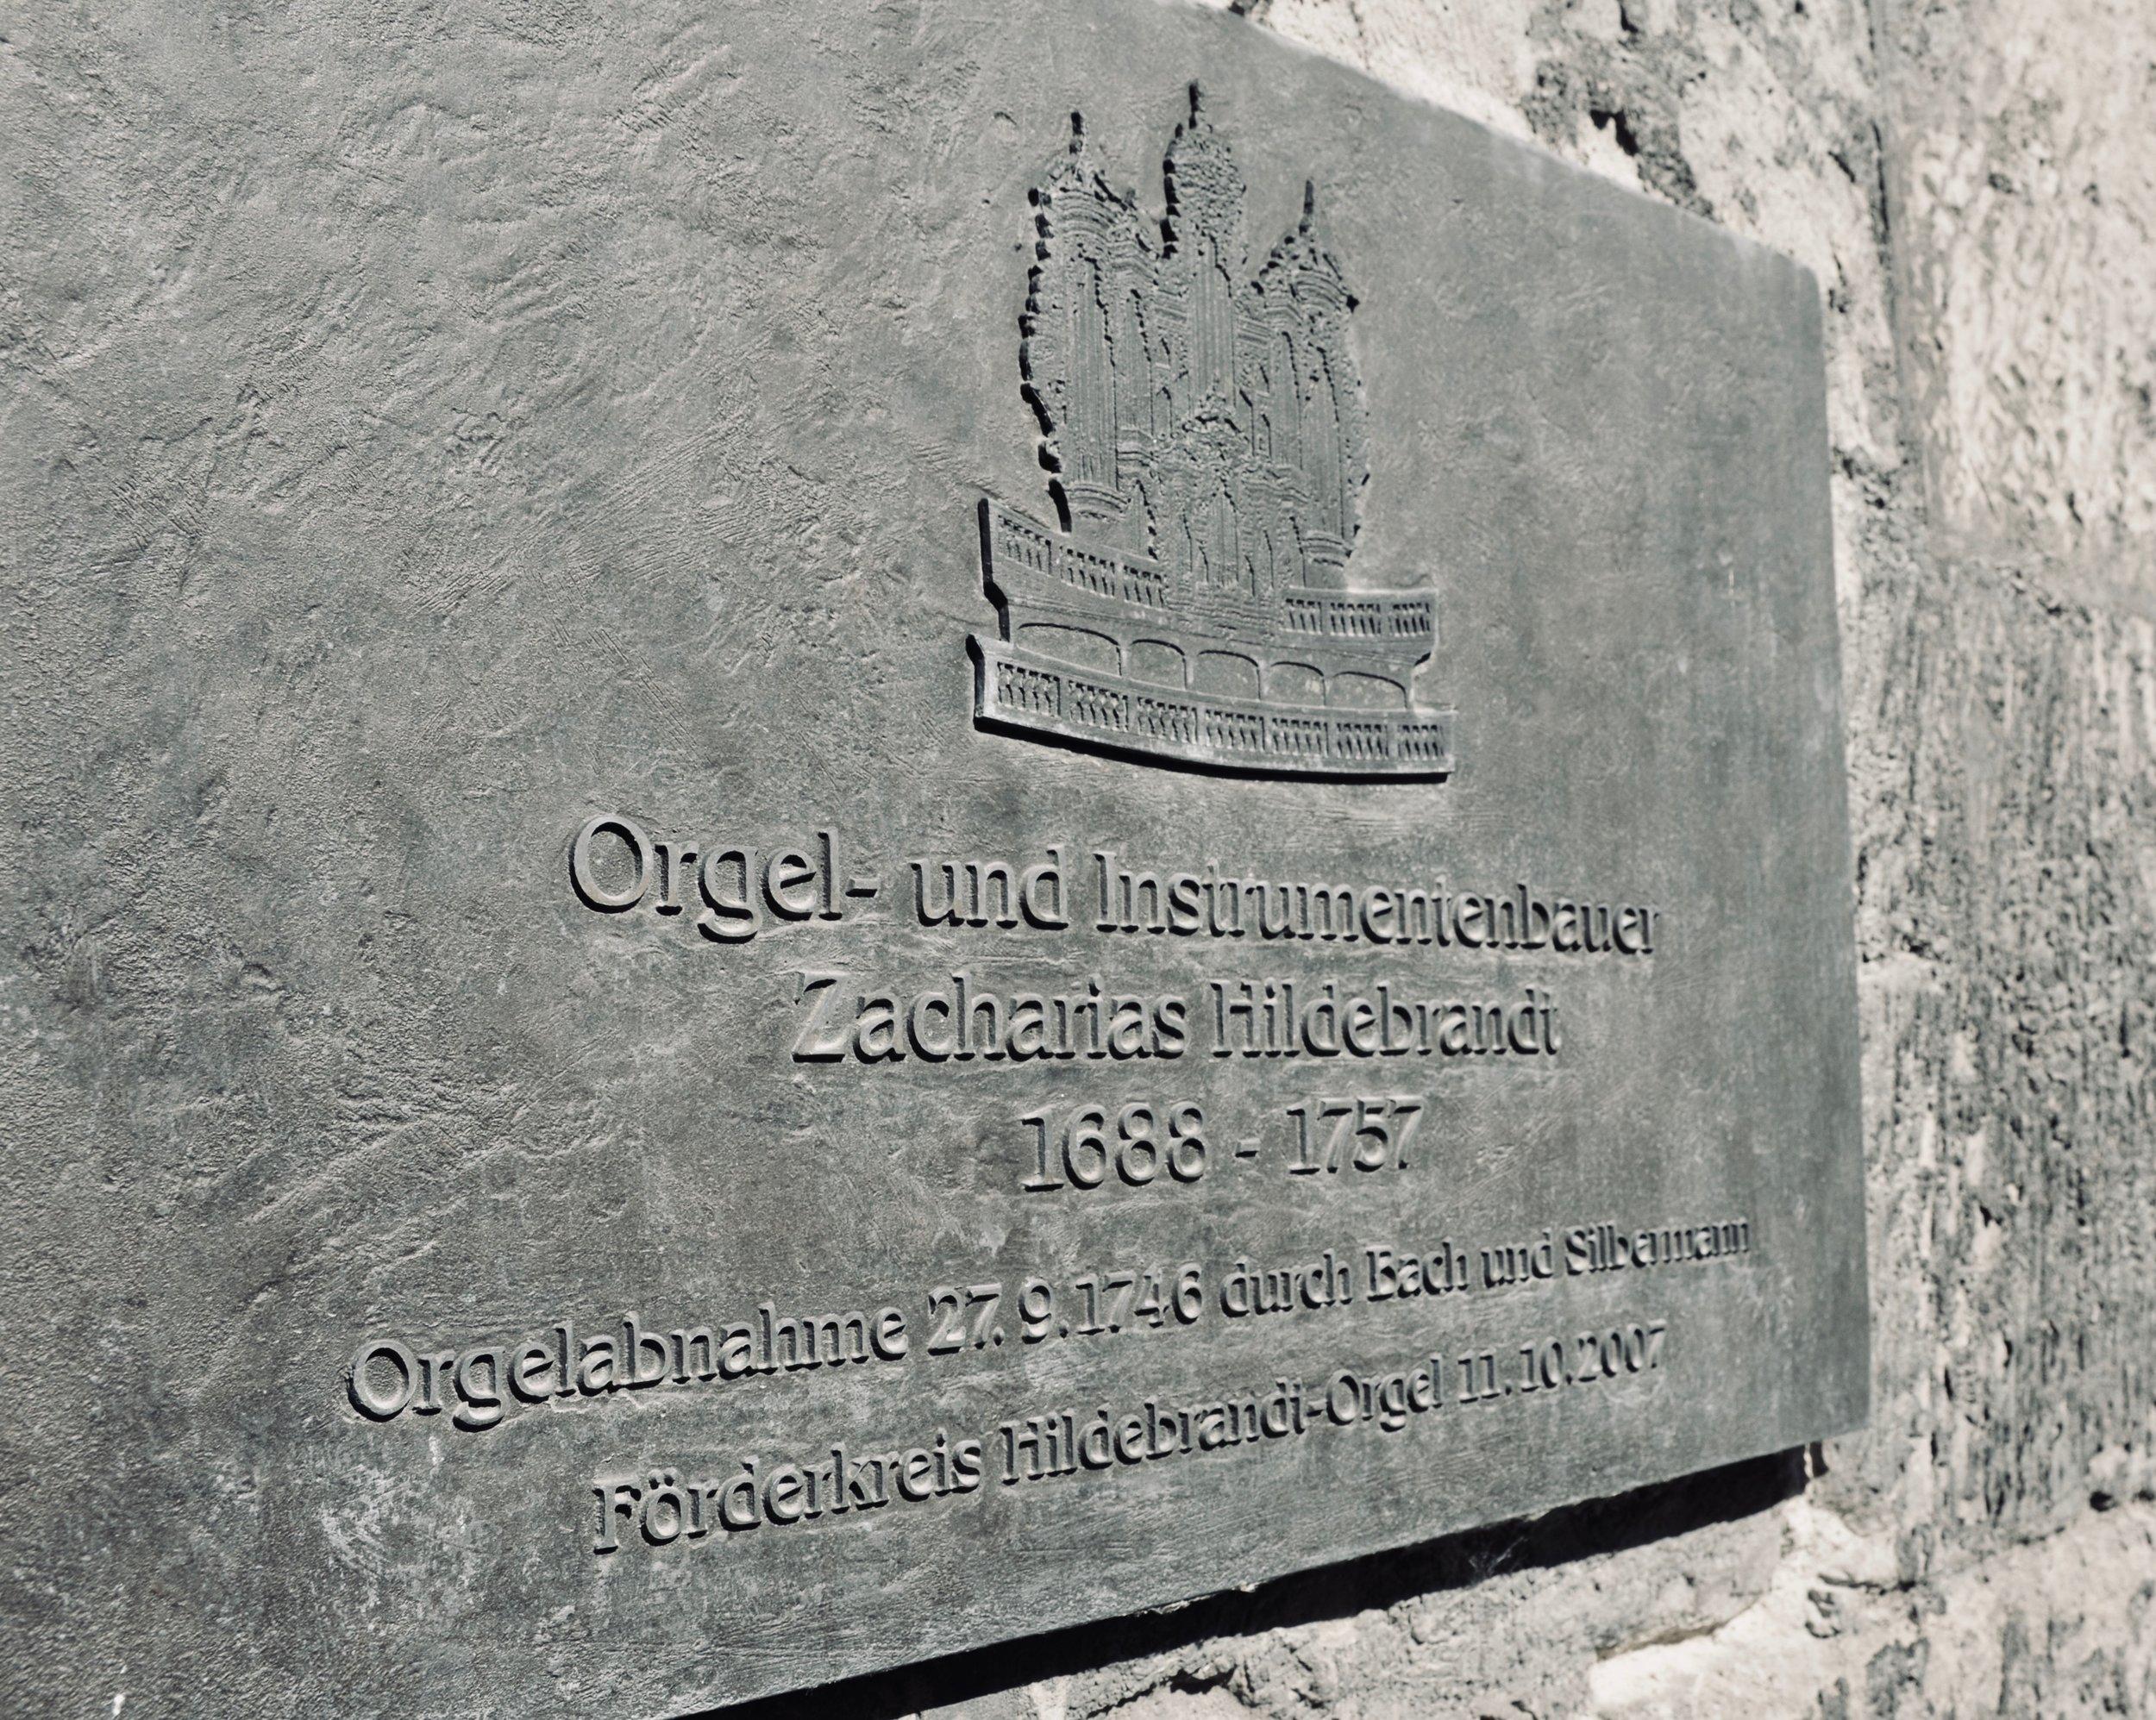 A plaque on the Stadtkirche St. Wenzel, Naumburg., noting the 1746 Hildebrandt Organ.